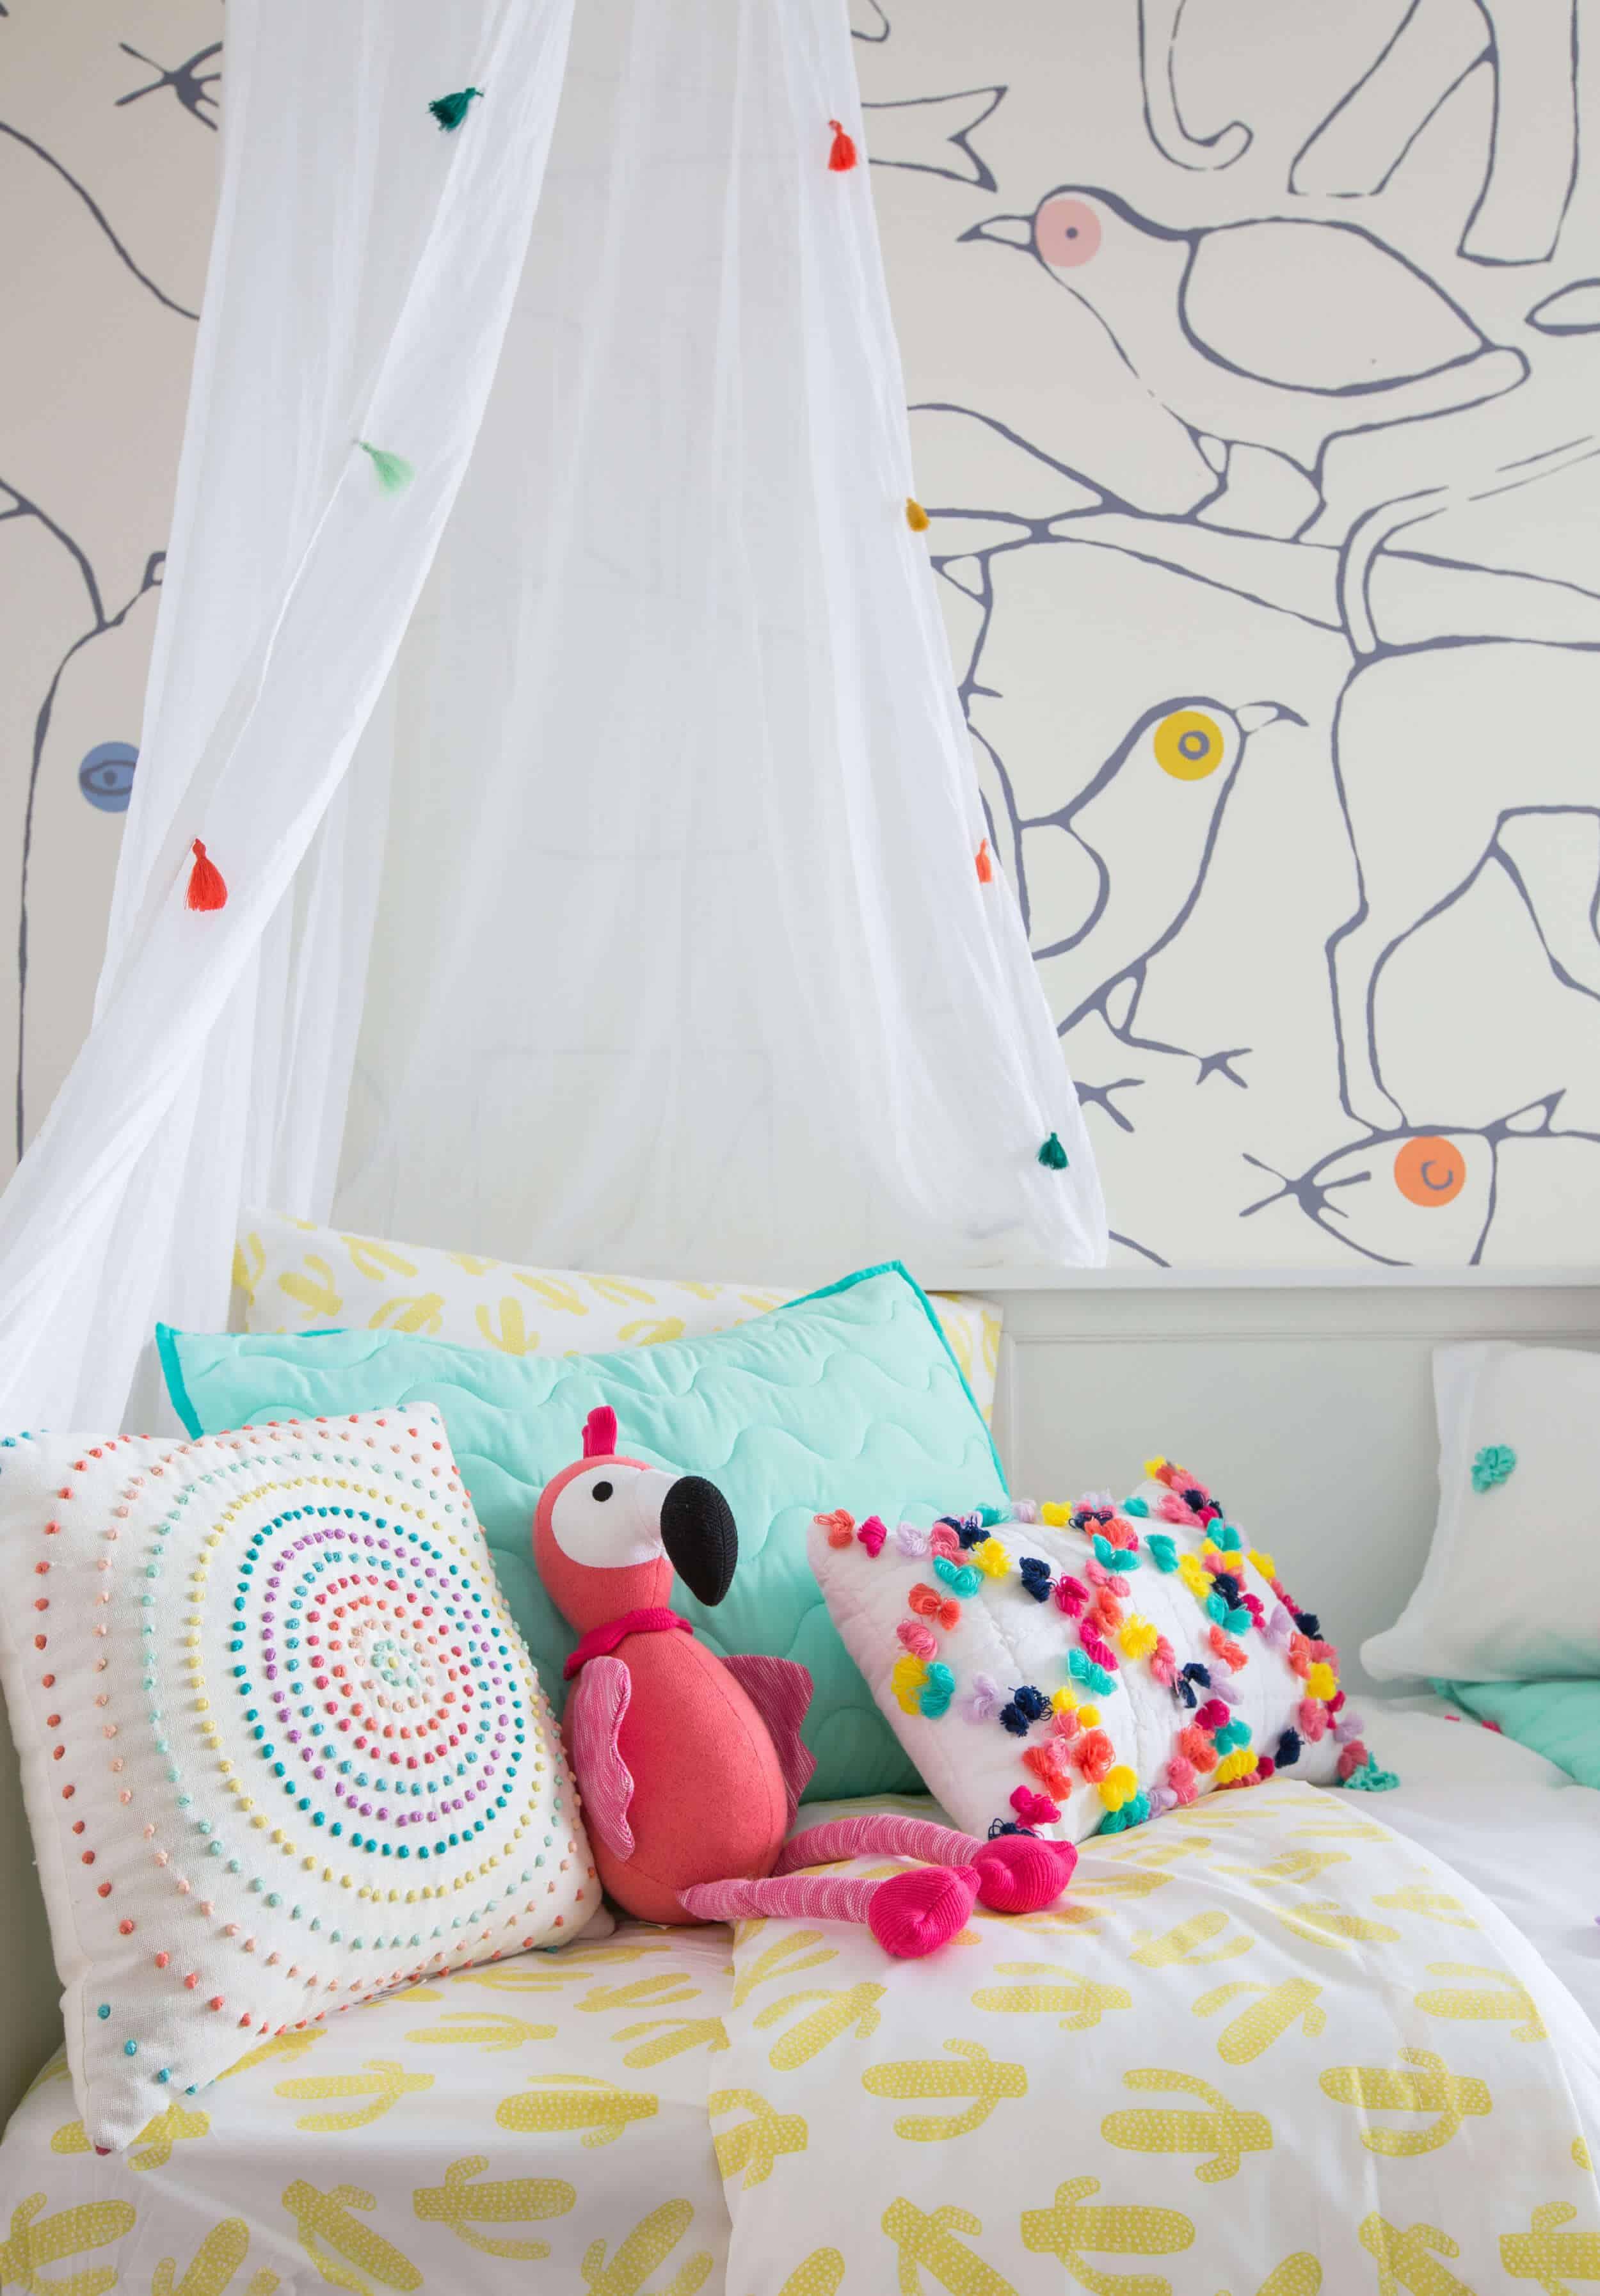 emily-henderson_kids-room_target_bedding_layered_light_texture_blue_white_brass_nursery_girls-room_bright_5